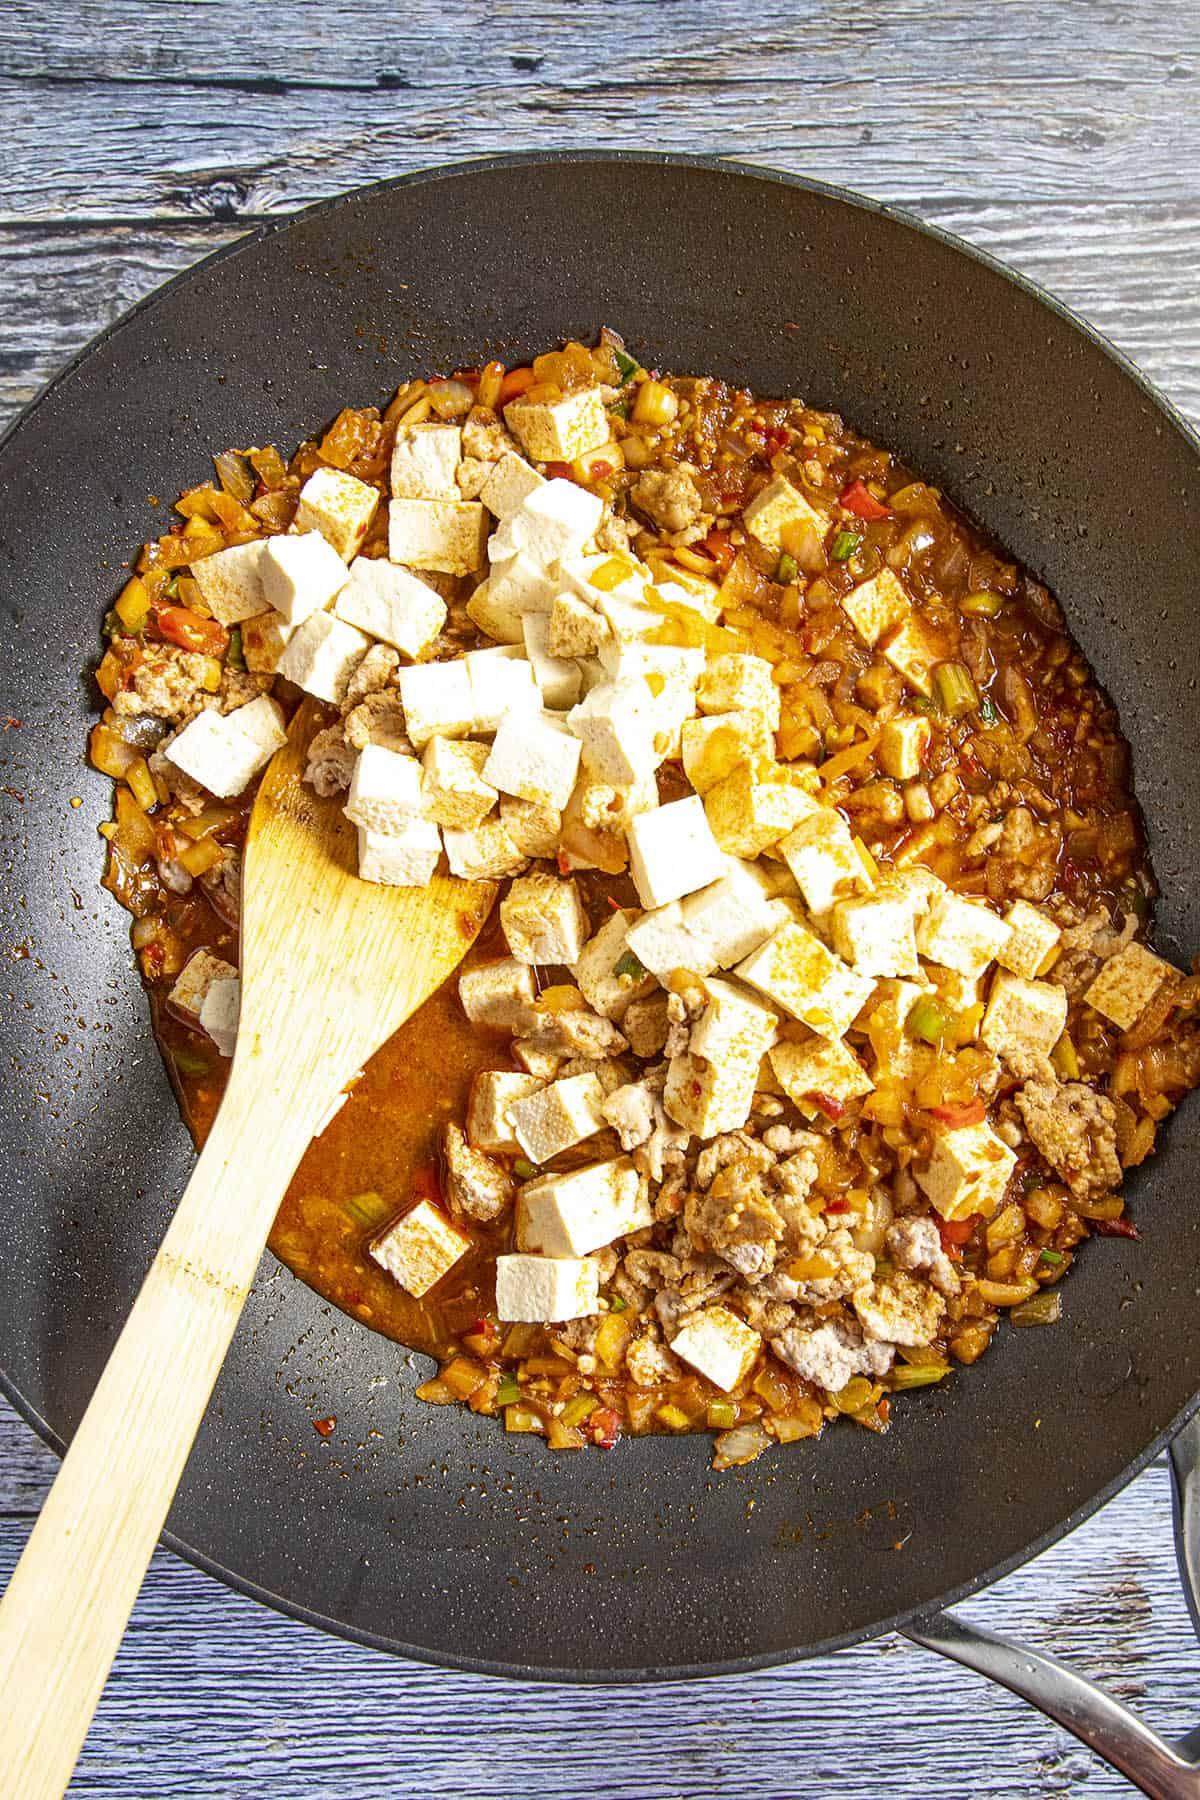 Stirring the tofu into my pan of Mapo Tofu